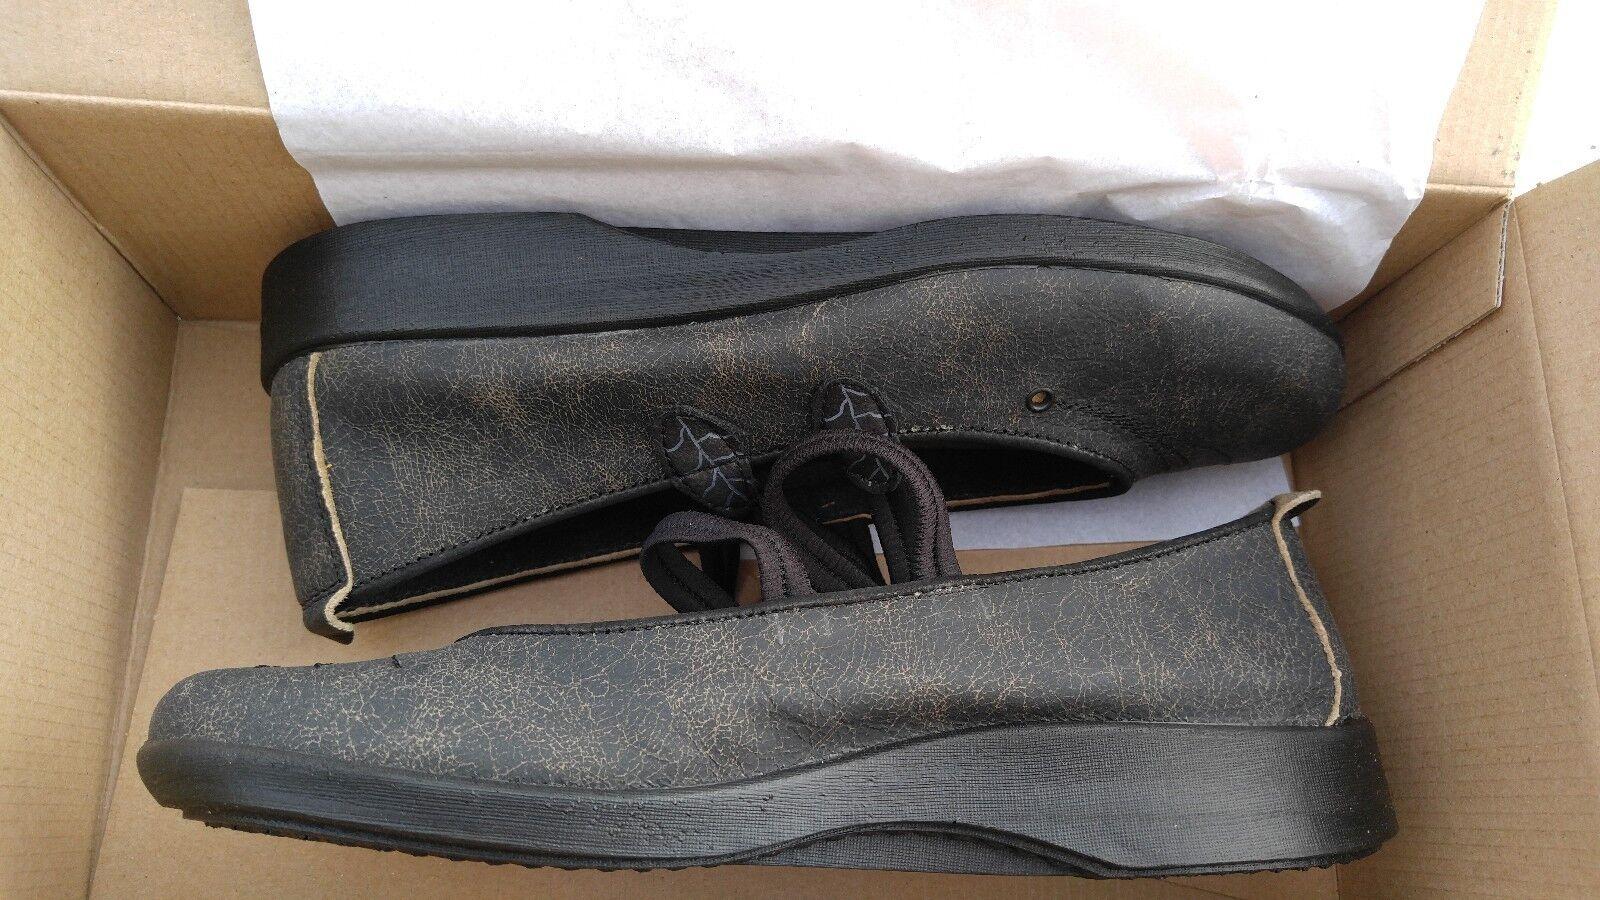 NIB Arcopedico 6383 Womens Blossom VB Black Ballet Flat Flat Flat Shoes 40 EU / 9 - 9.5 US 608f86